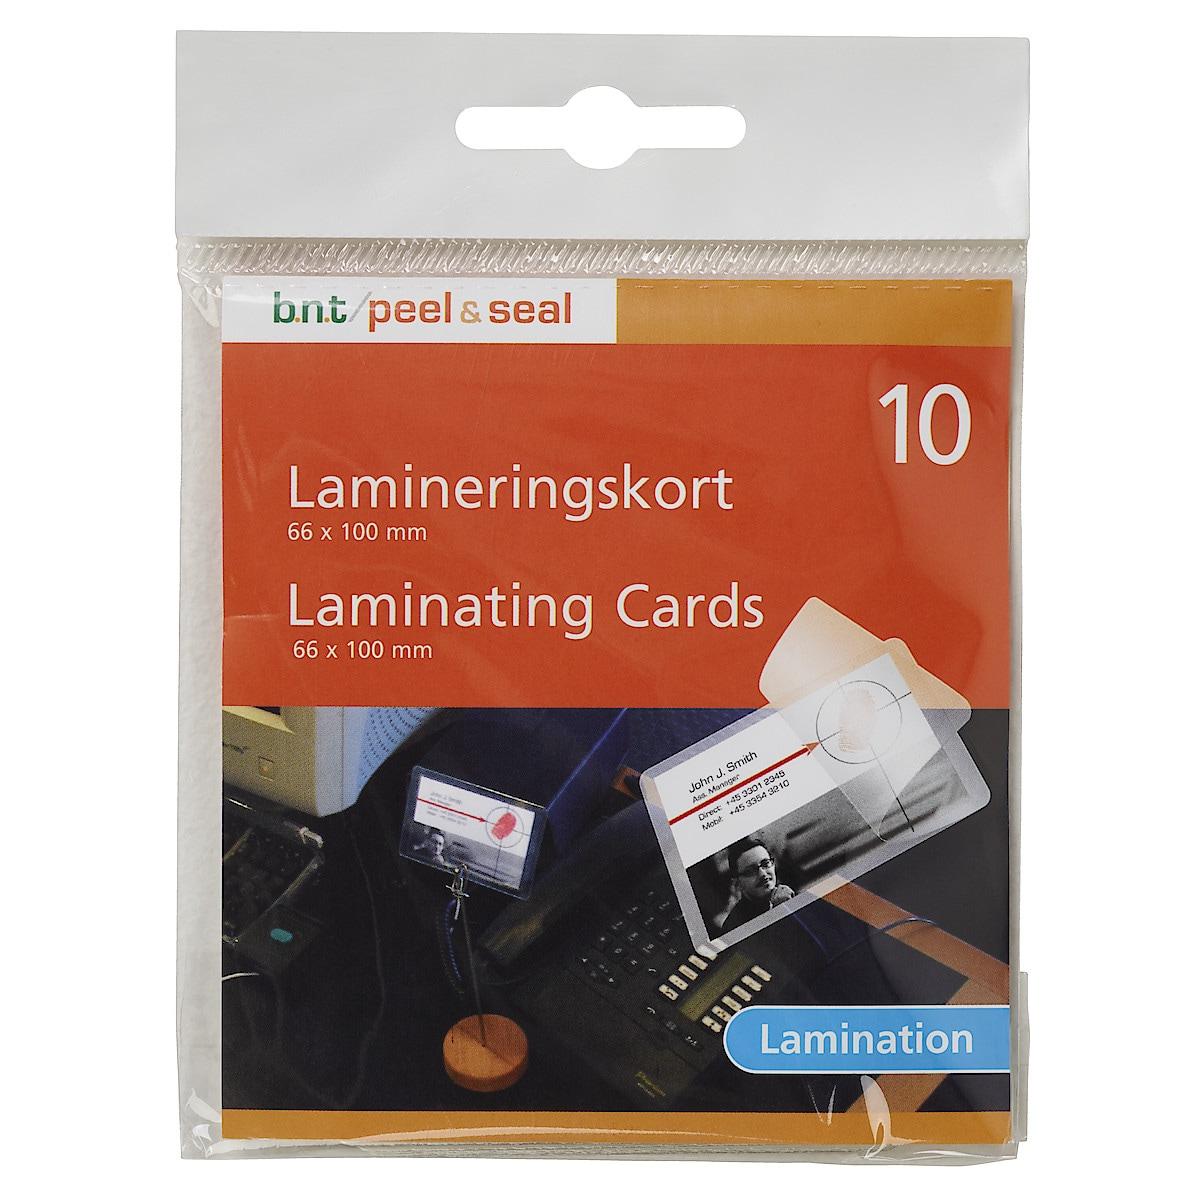 Laminat for kaldlaminering,10 stk/pk